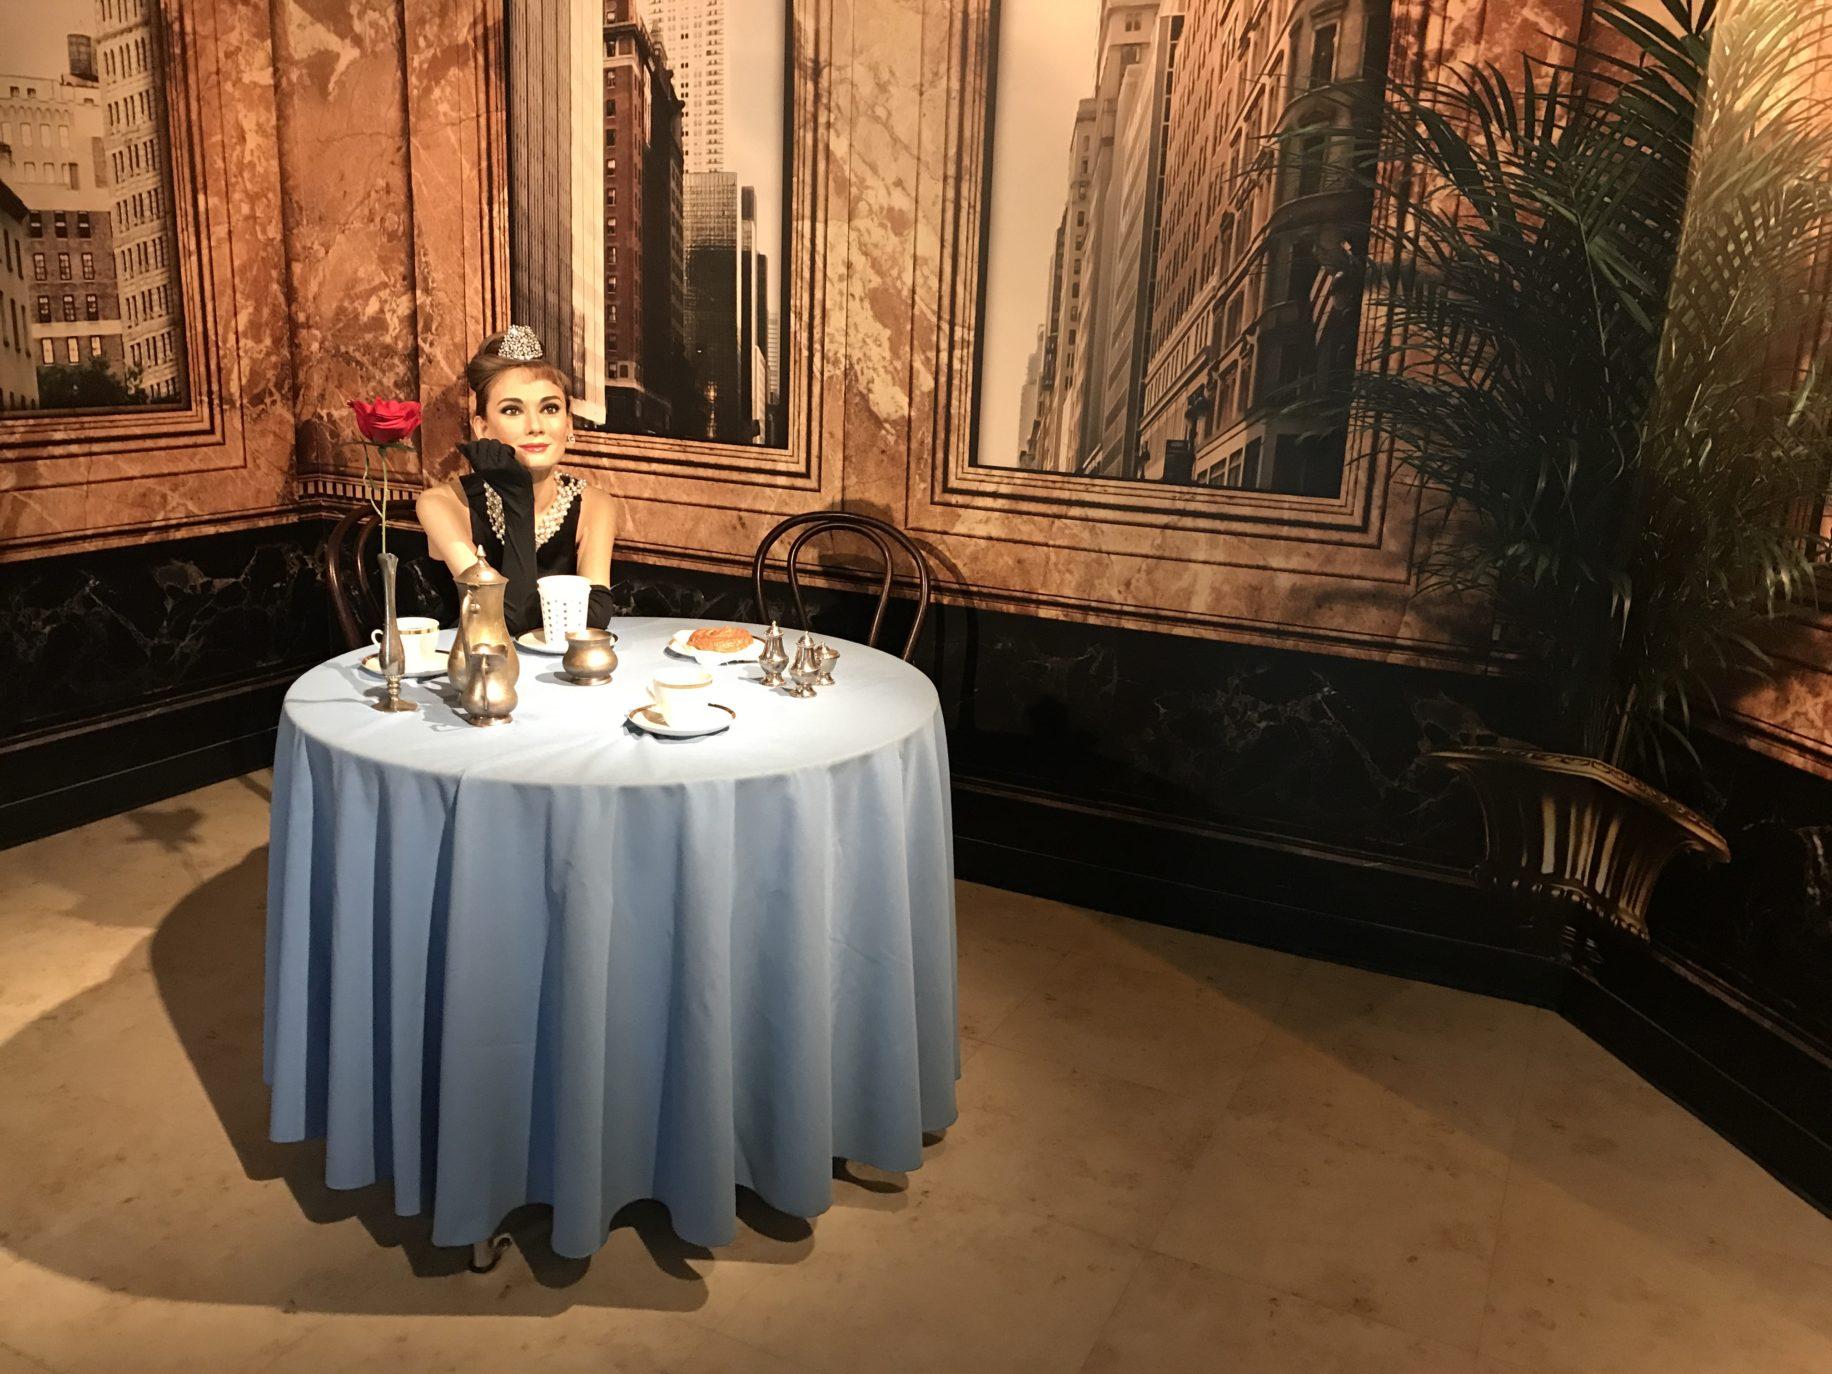 Breakfast at Tiffany's Anyone?  Image: Dakster Sullivan